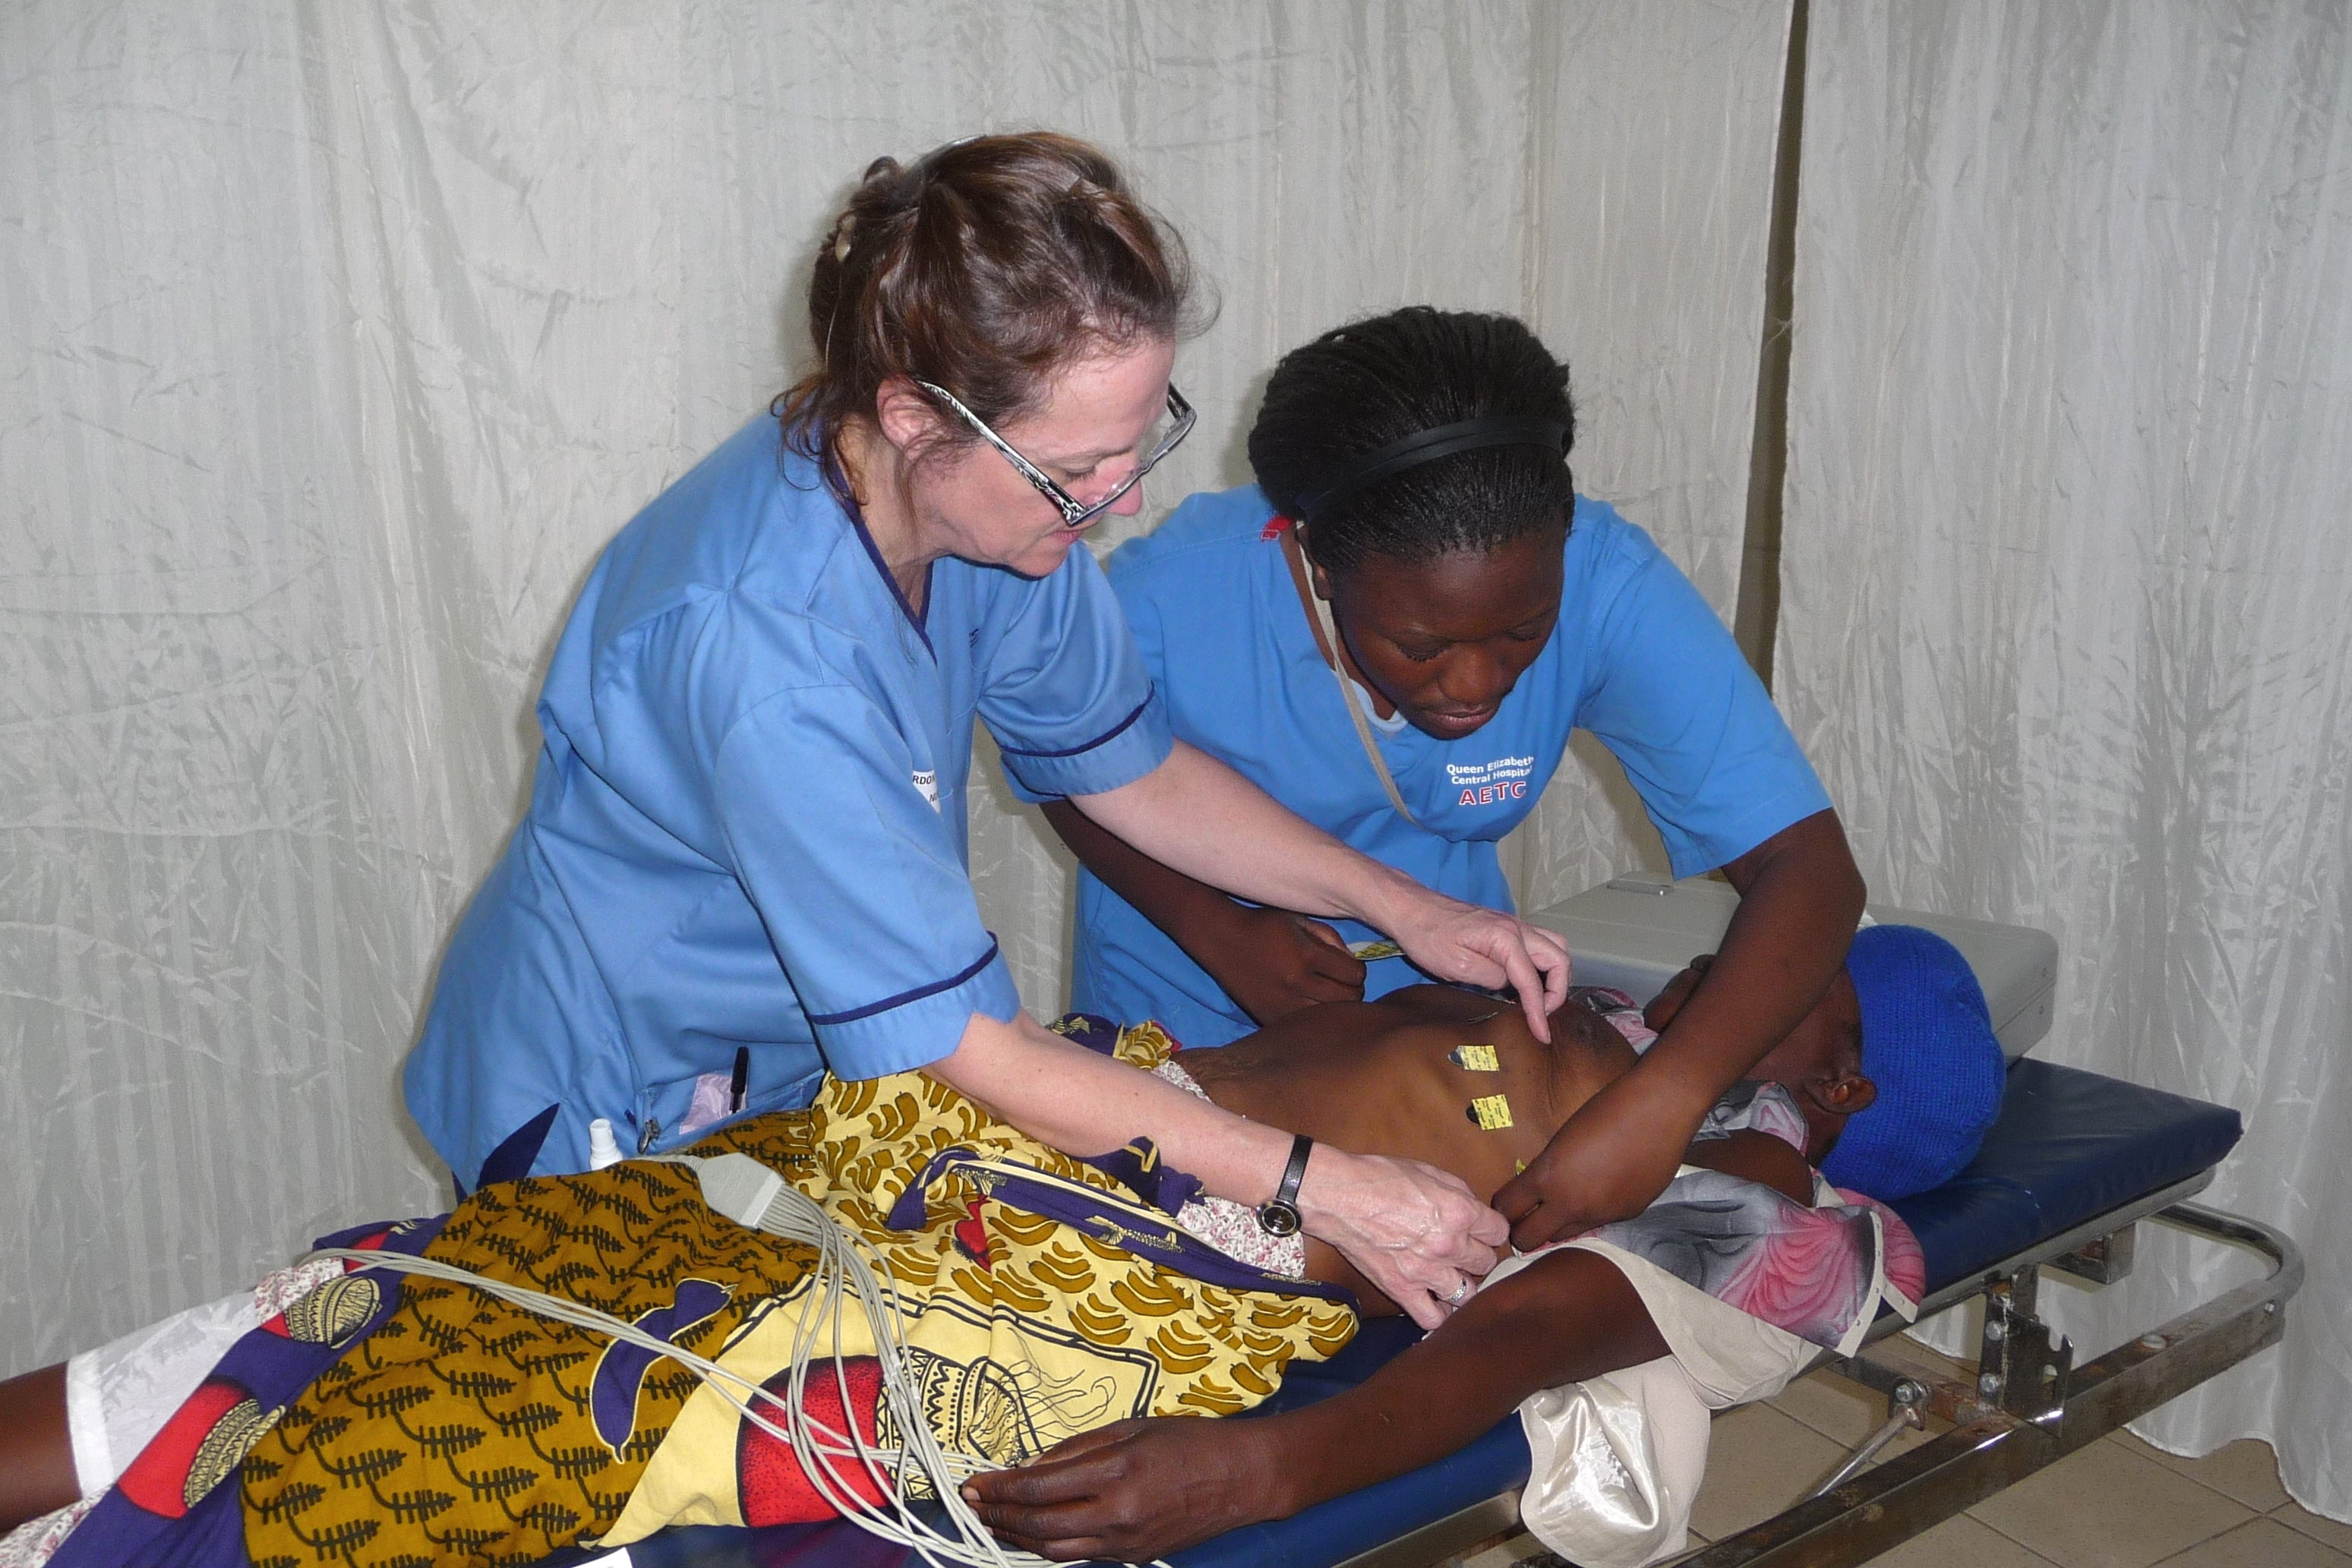 Lead project nurse Gwen Gordon at work mentoring staff in Blantyre, Malawi.